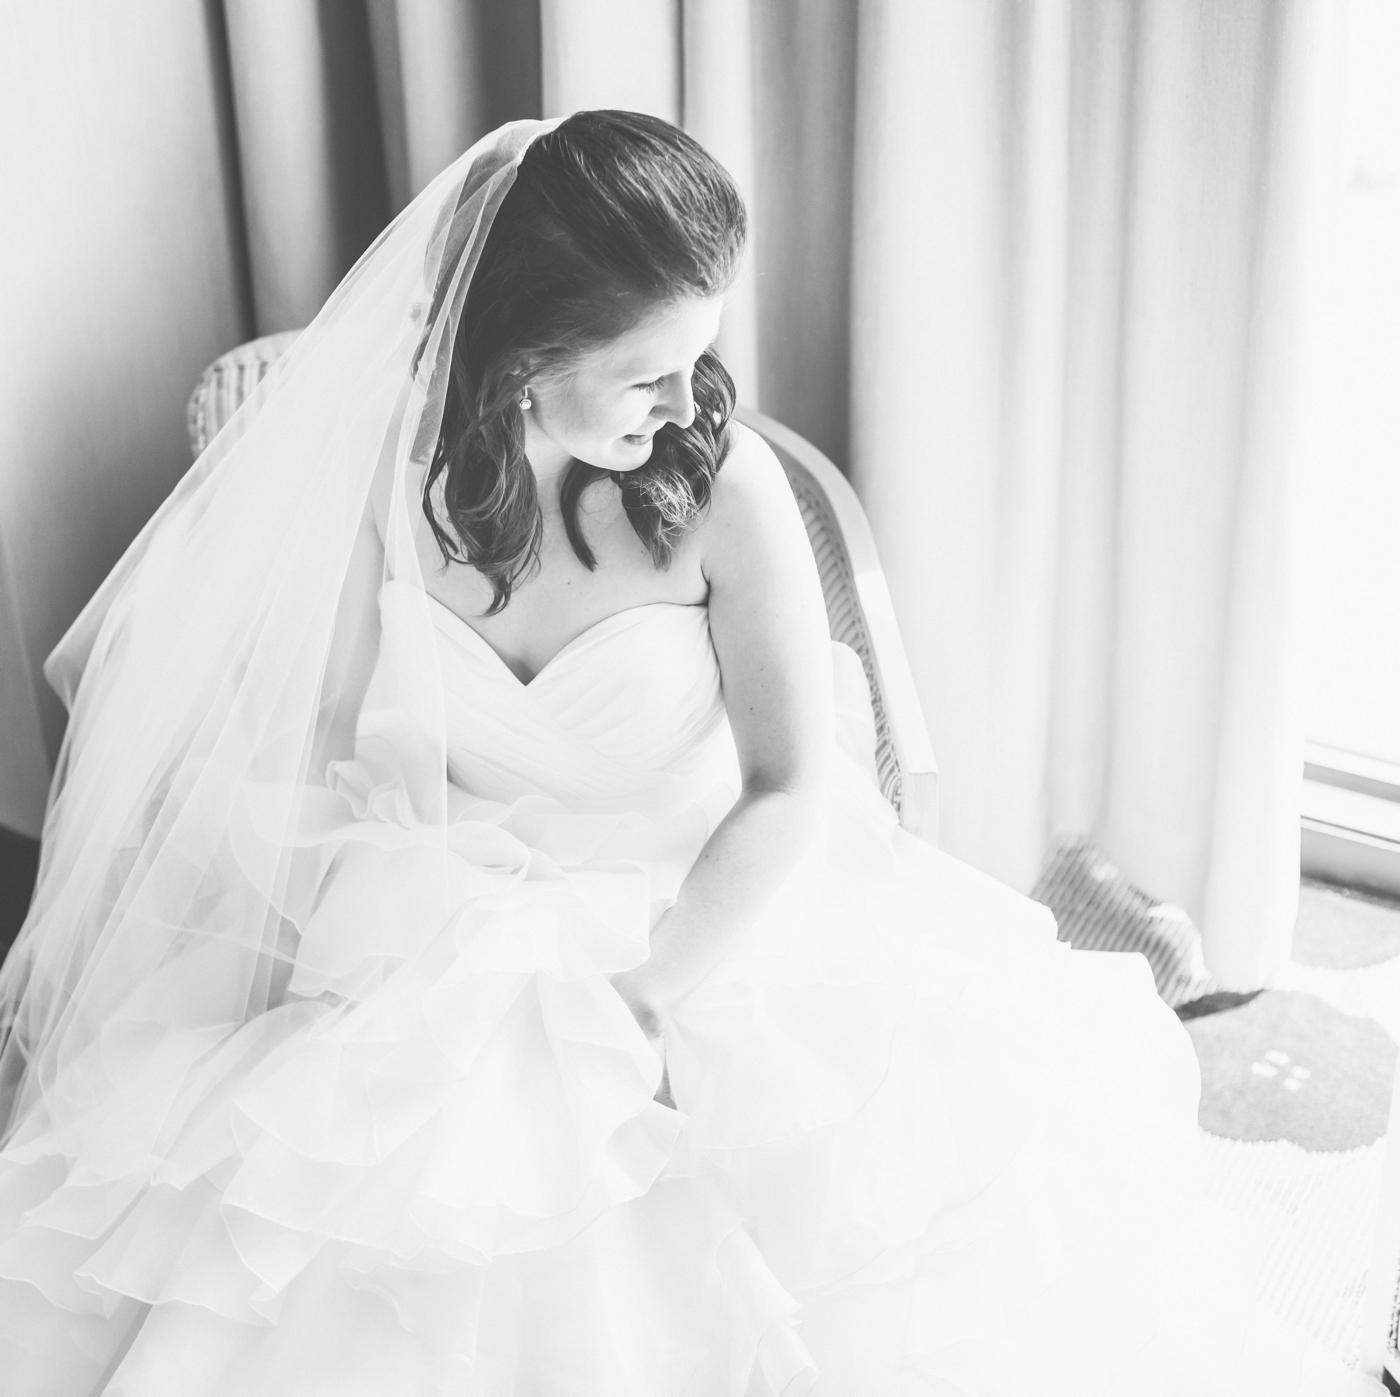 chicago-fine-art-wedding-photography-raz7